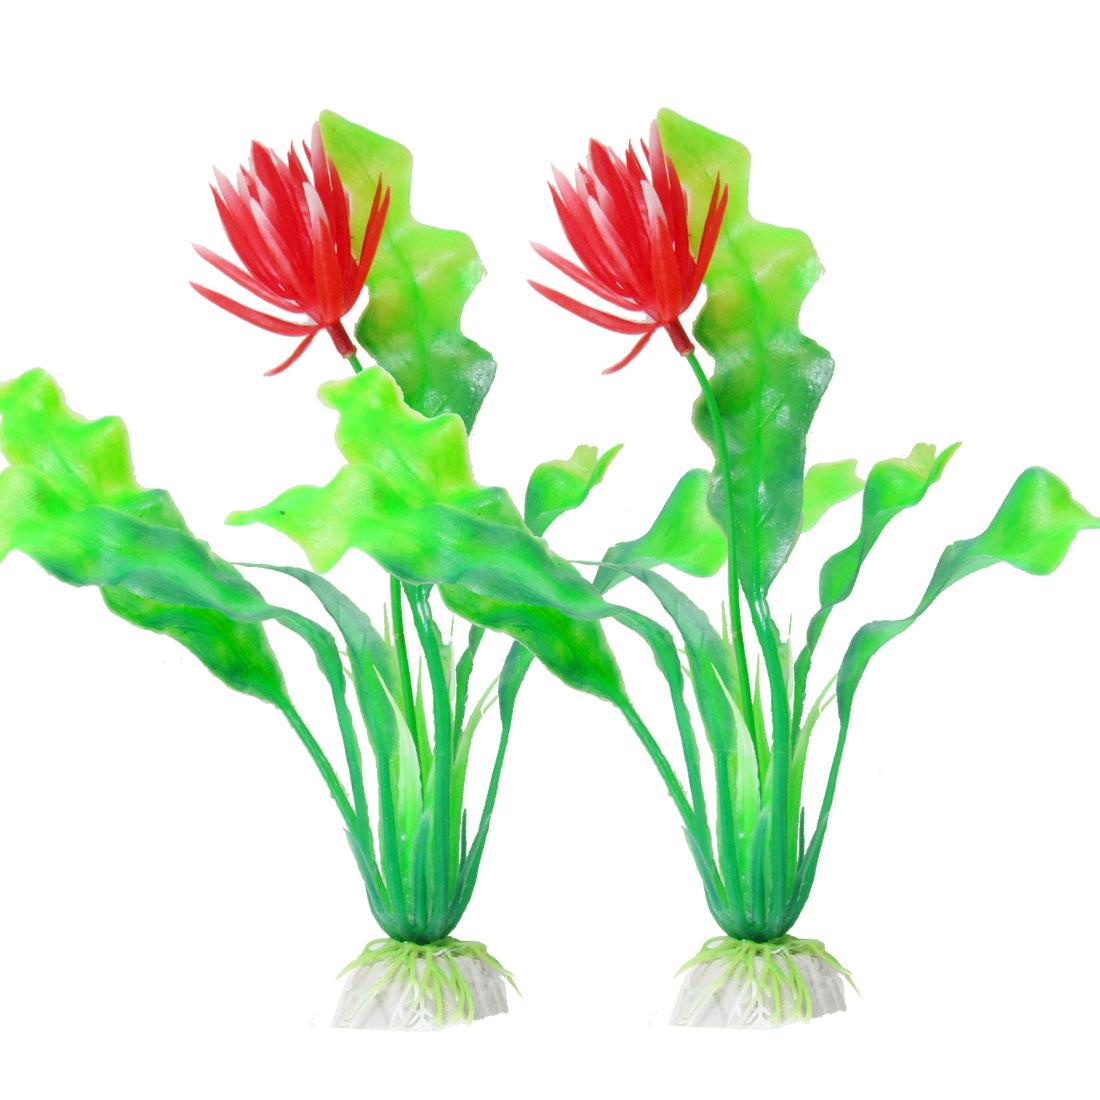 "2 Pcs Red Green Plastic Flower Plant Ornament 7.9"" for Aquarium Fish Tank"